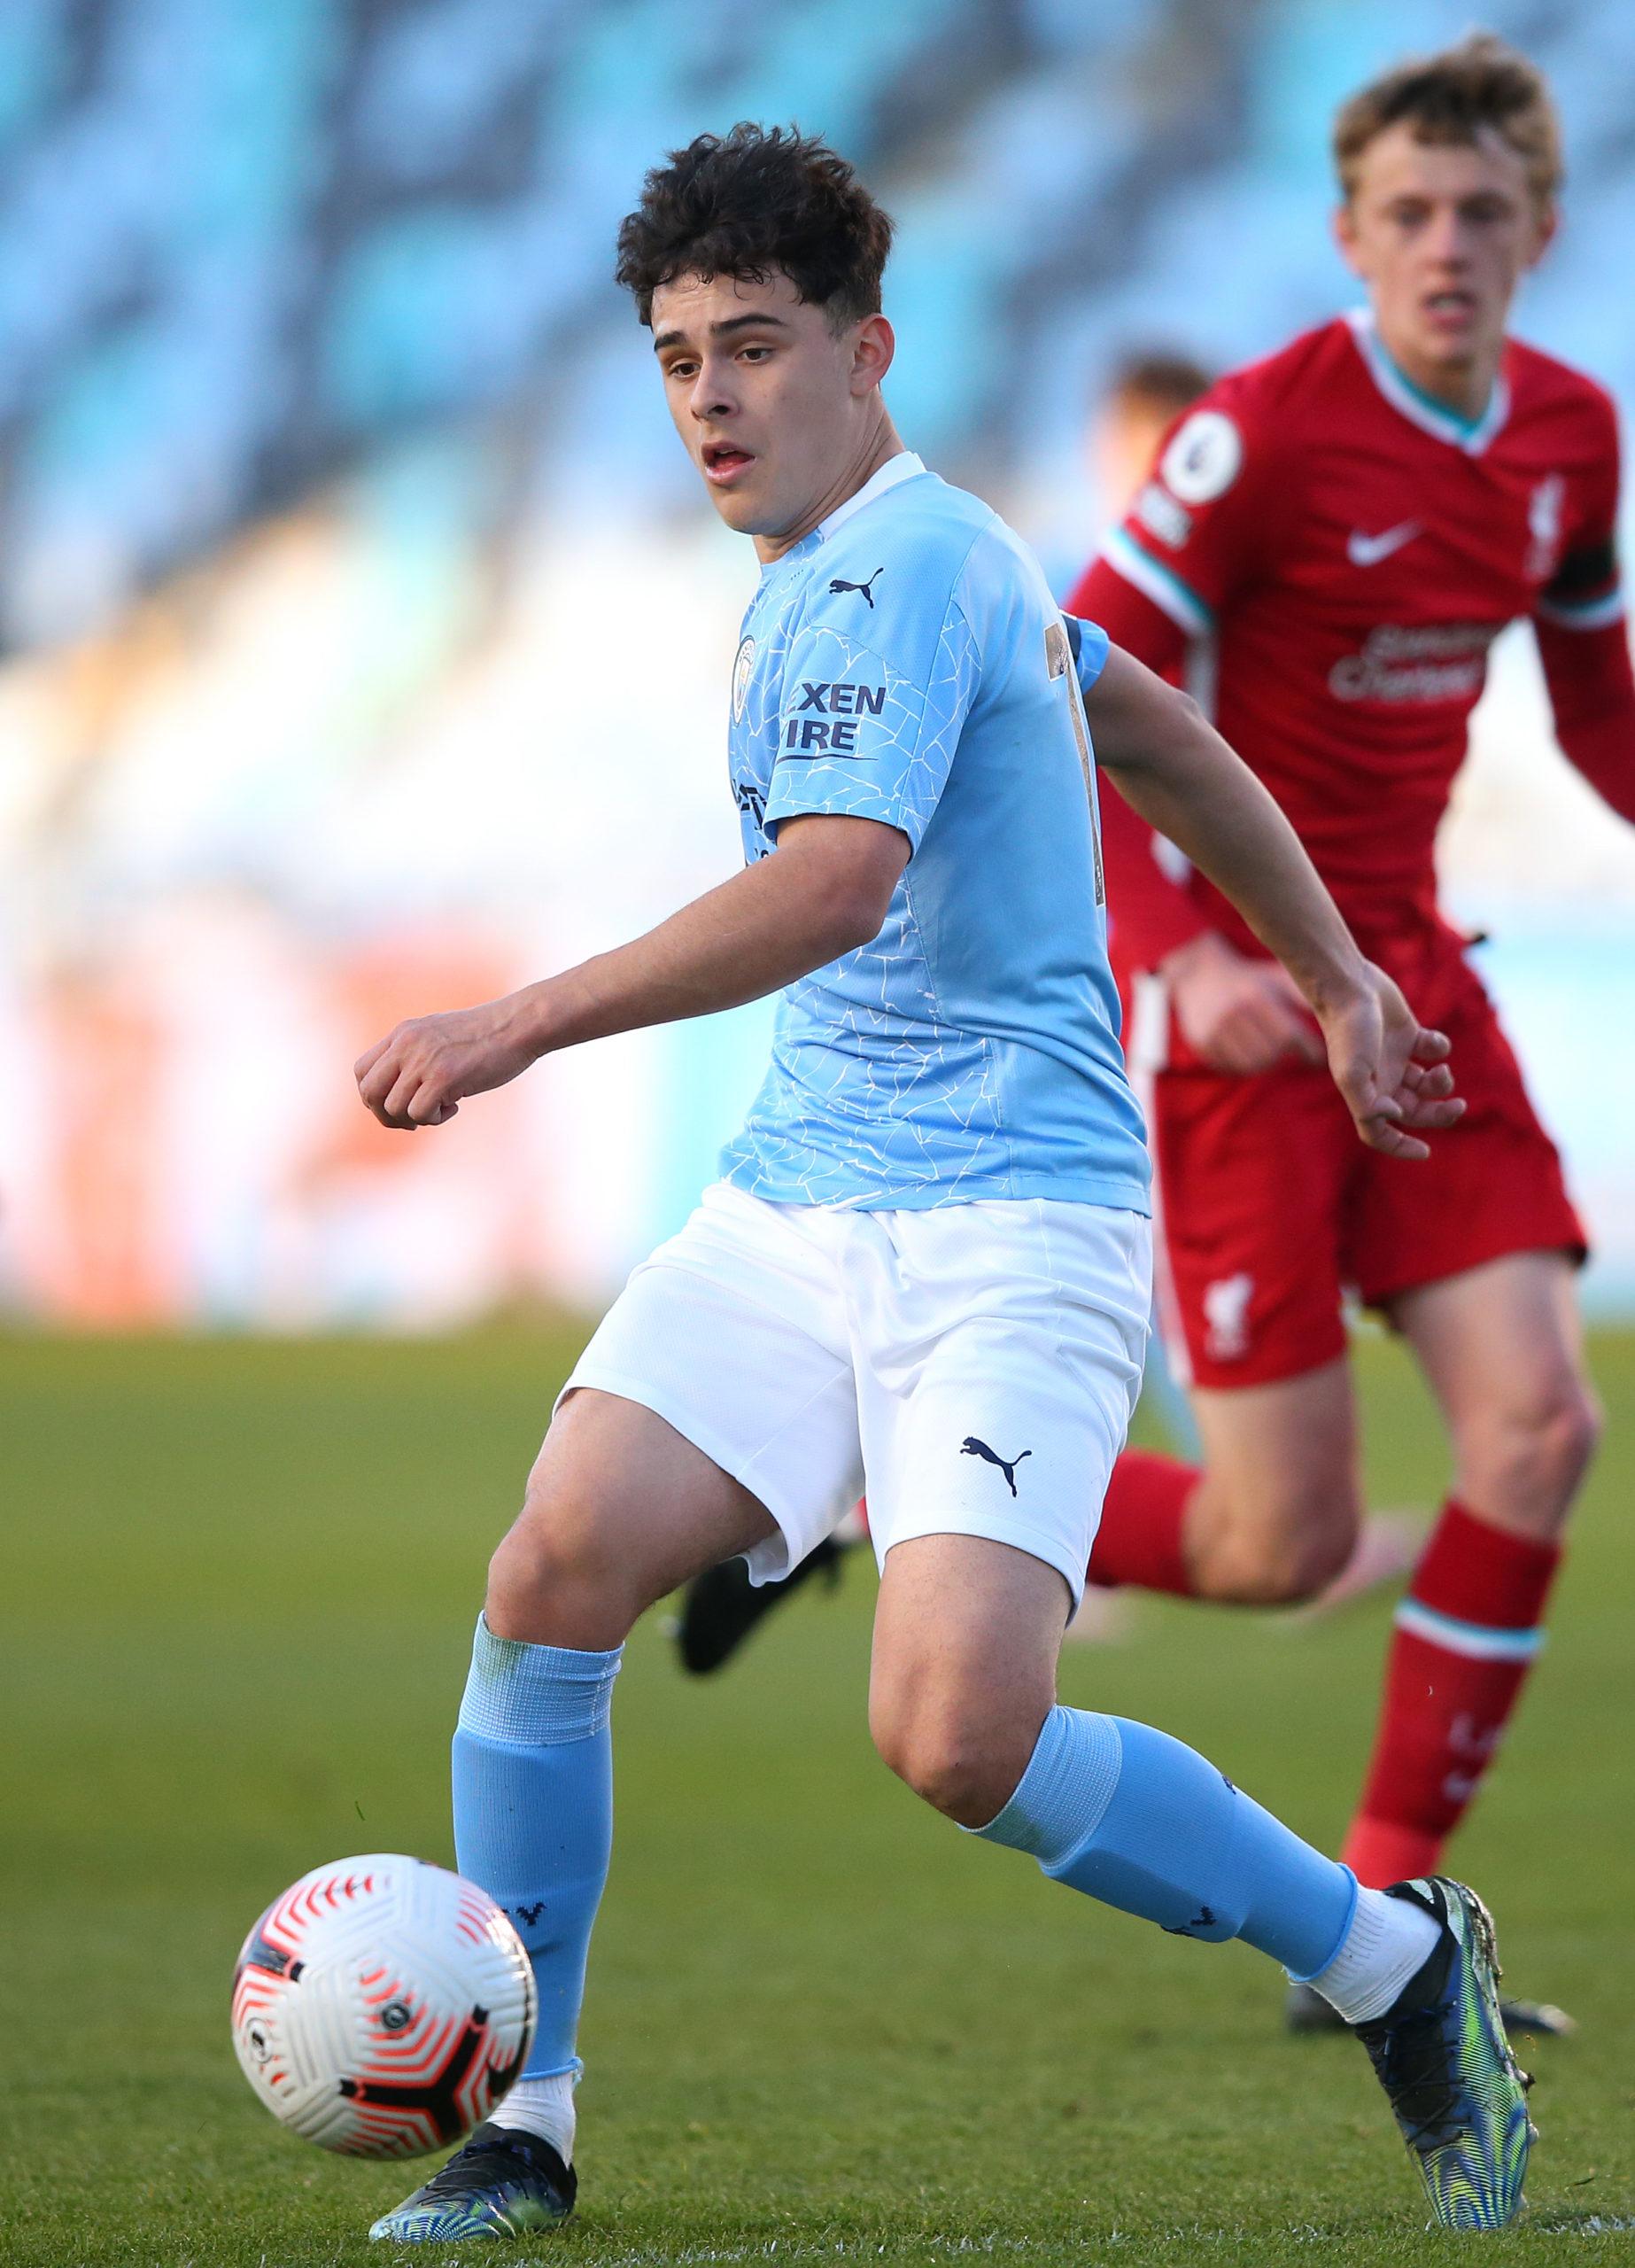 Manchester City U23 v Liverpool U23 - Premier League 2